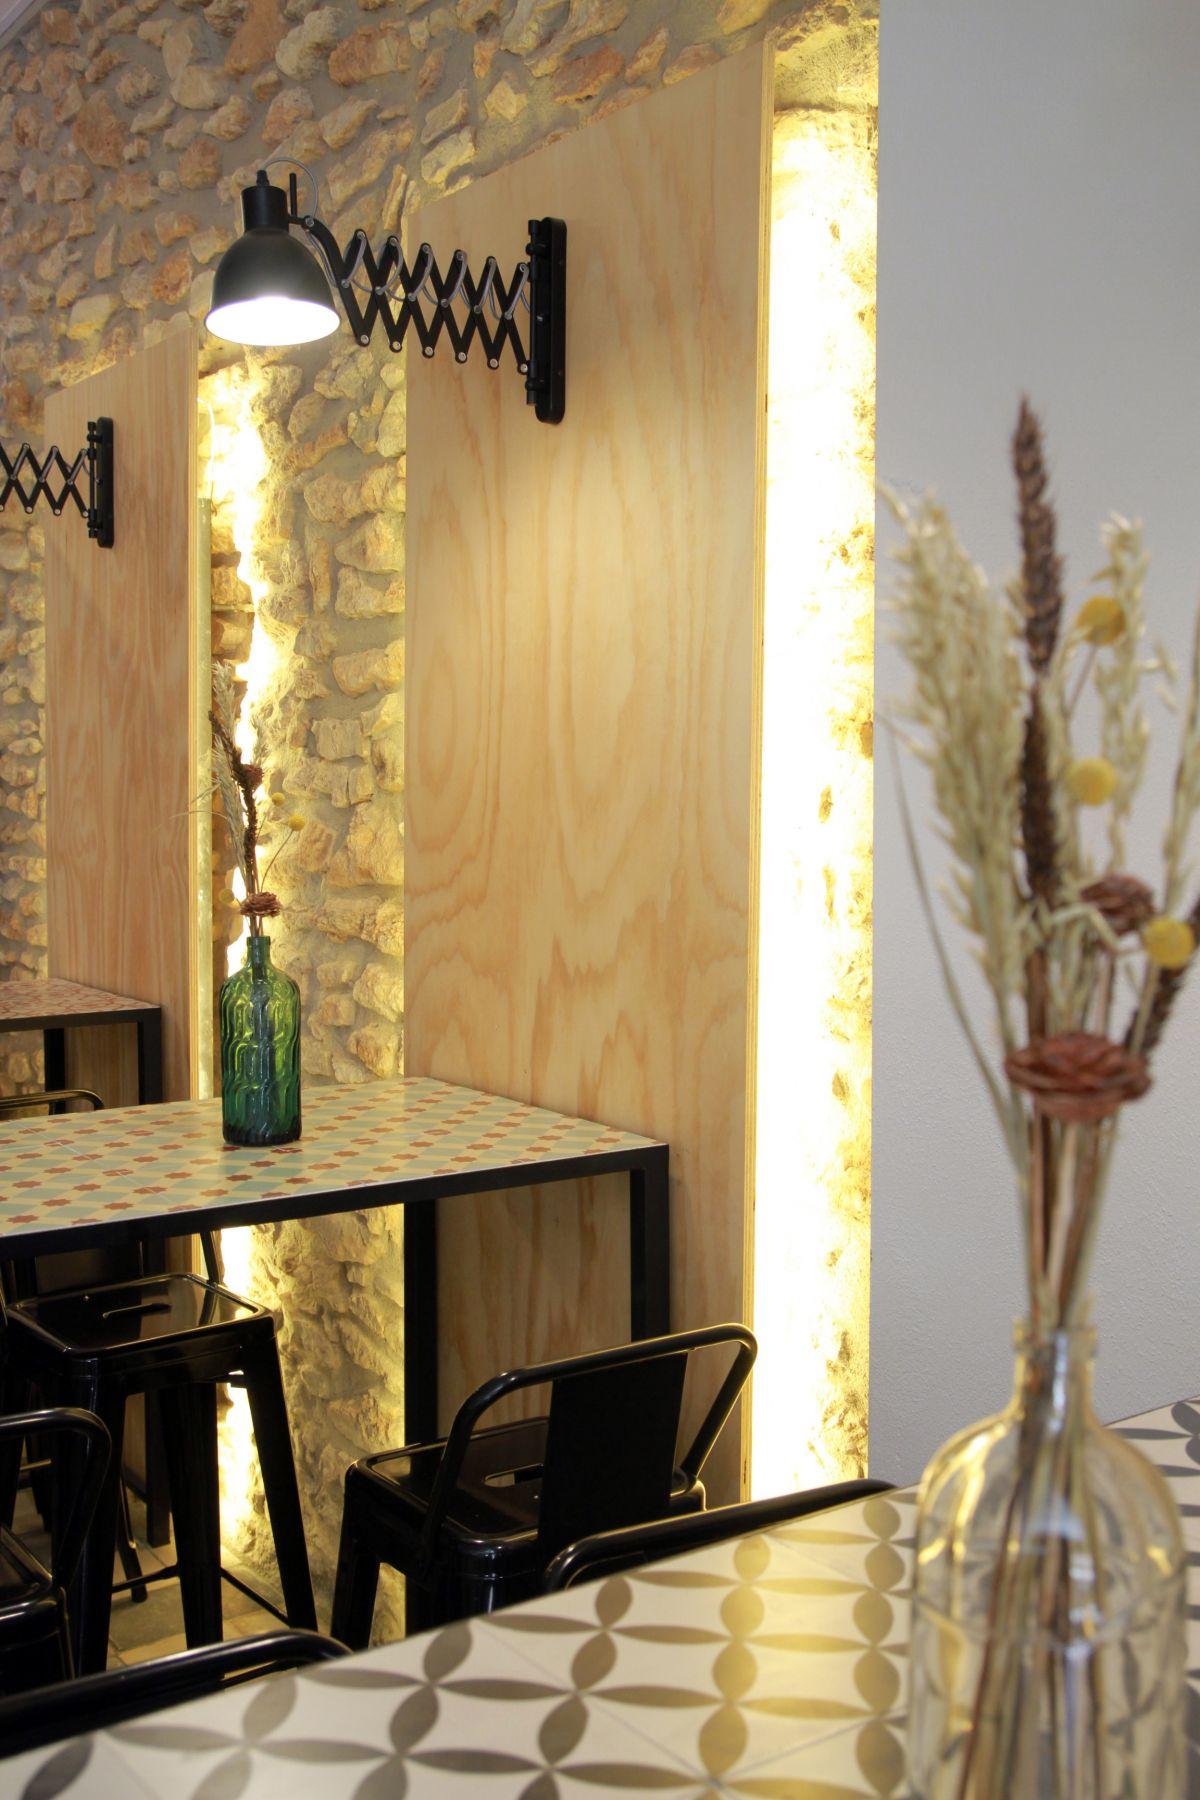 interiorisme, estudio, hidràulica disseny, refoma, diseño interior, interiorismo, decoración, la Sifoneria, Taperia, bocateria, Amposta, Delta de l'Ebre, TTEE, mosaic hidràulic, tobes, morter, formigó, nordico, nòrdic, la sifoneria amposta, wood, plywood